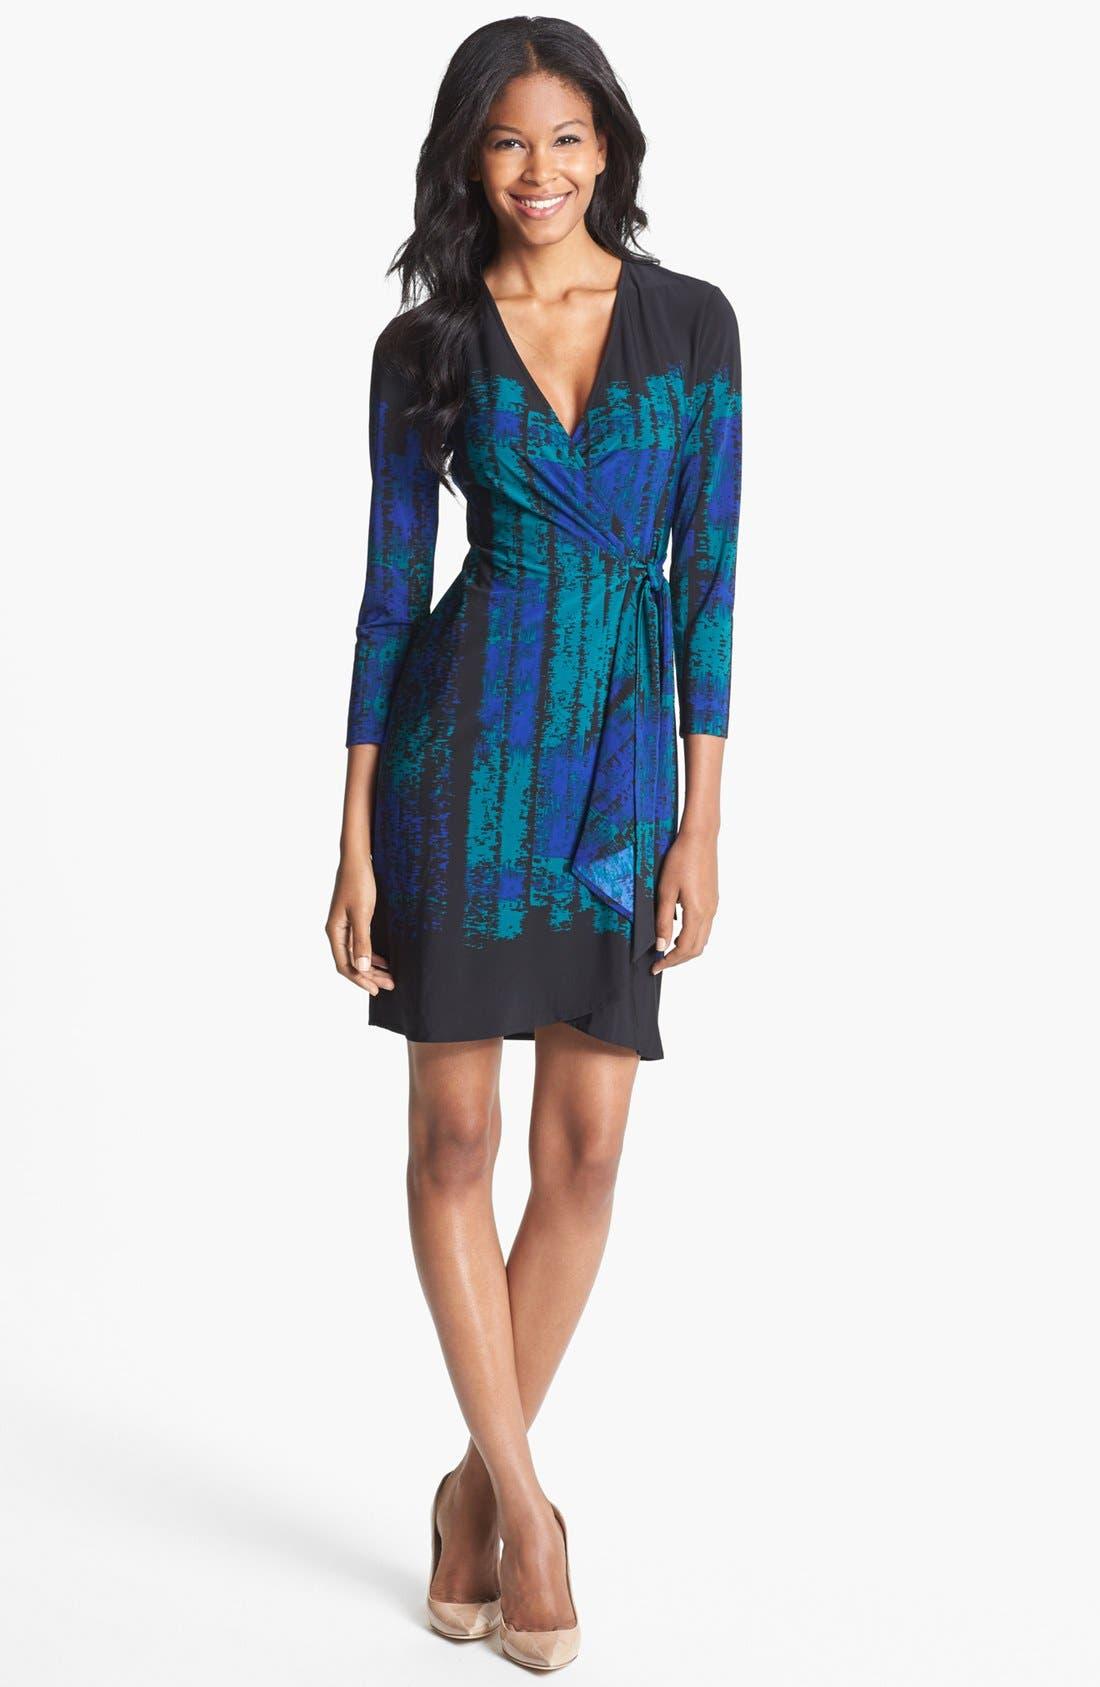 Alternate Image 1 Selected - BCBGMAXAZRIA 'Adele' Print Jersey Wrap Dress